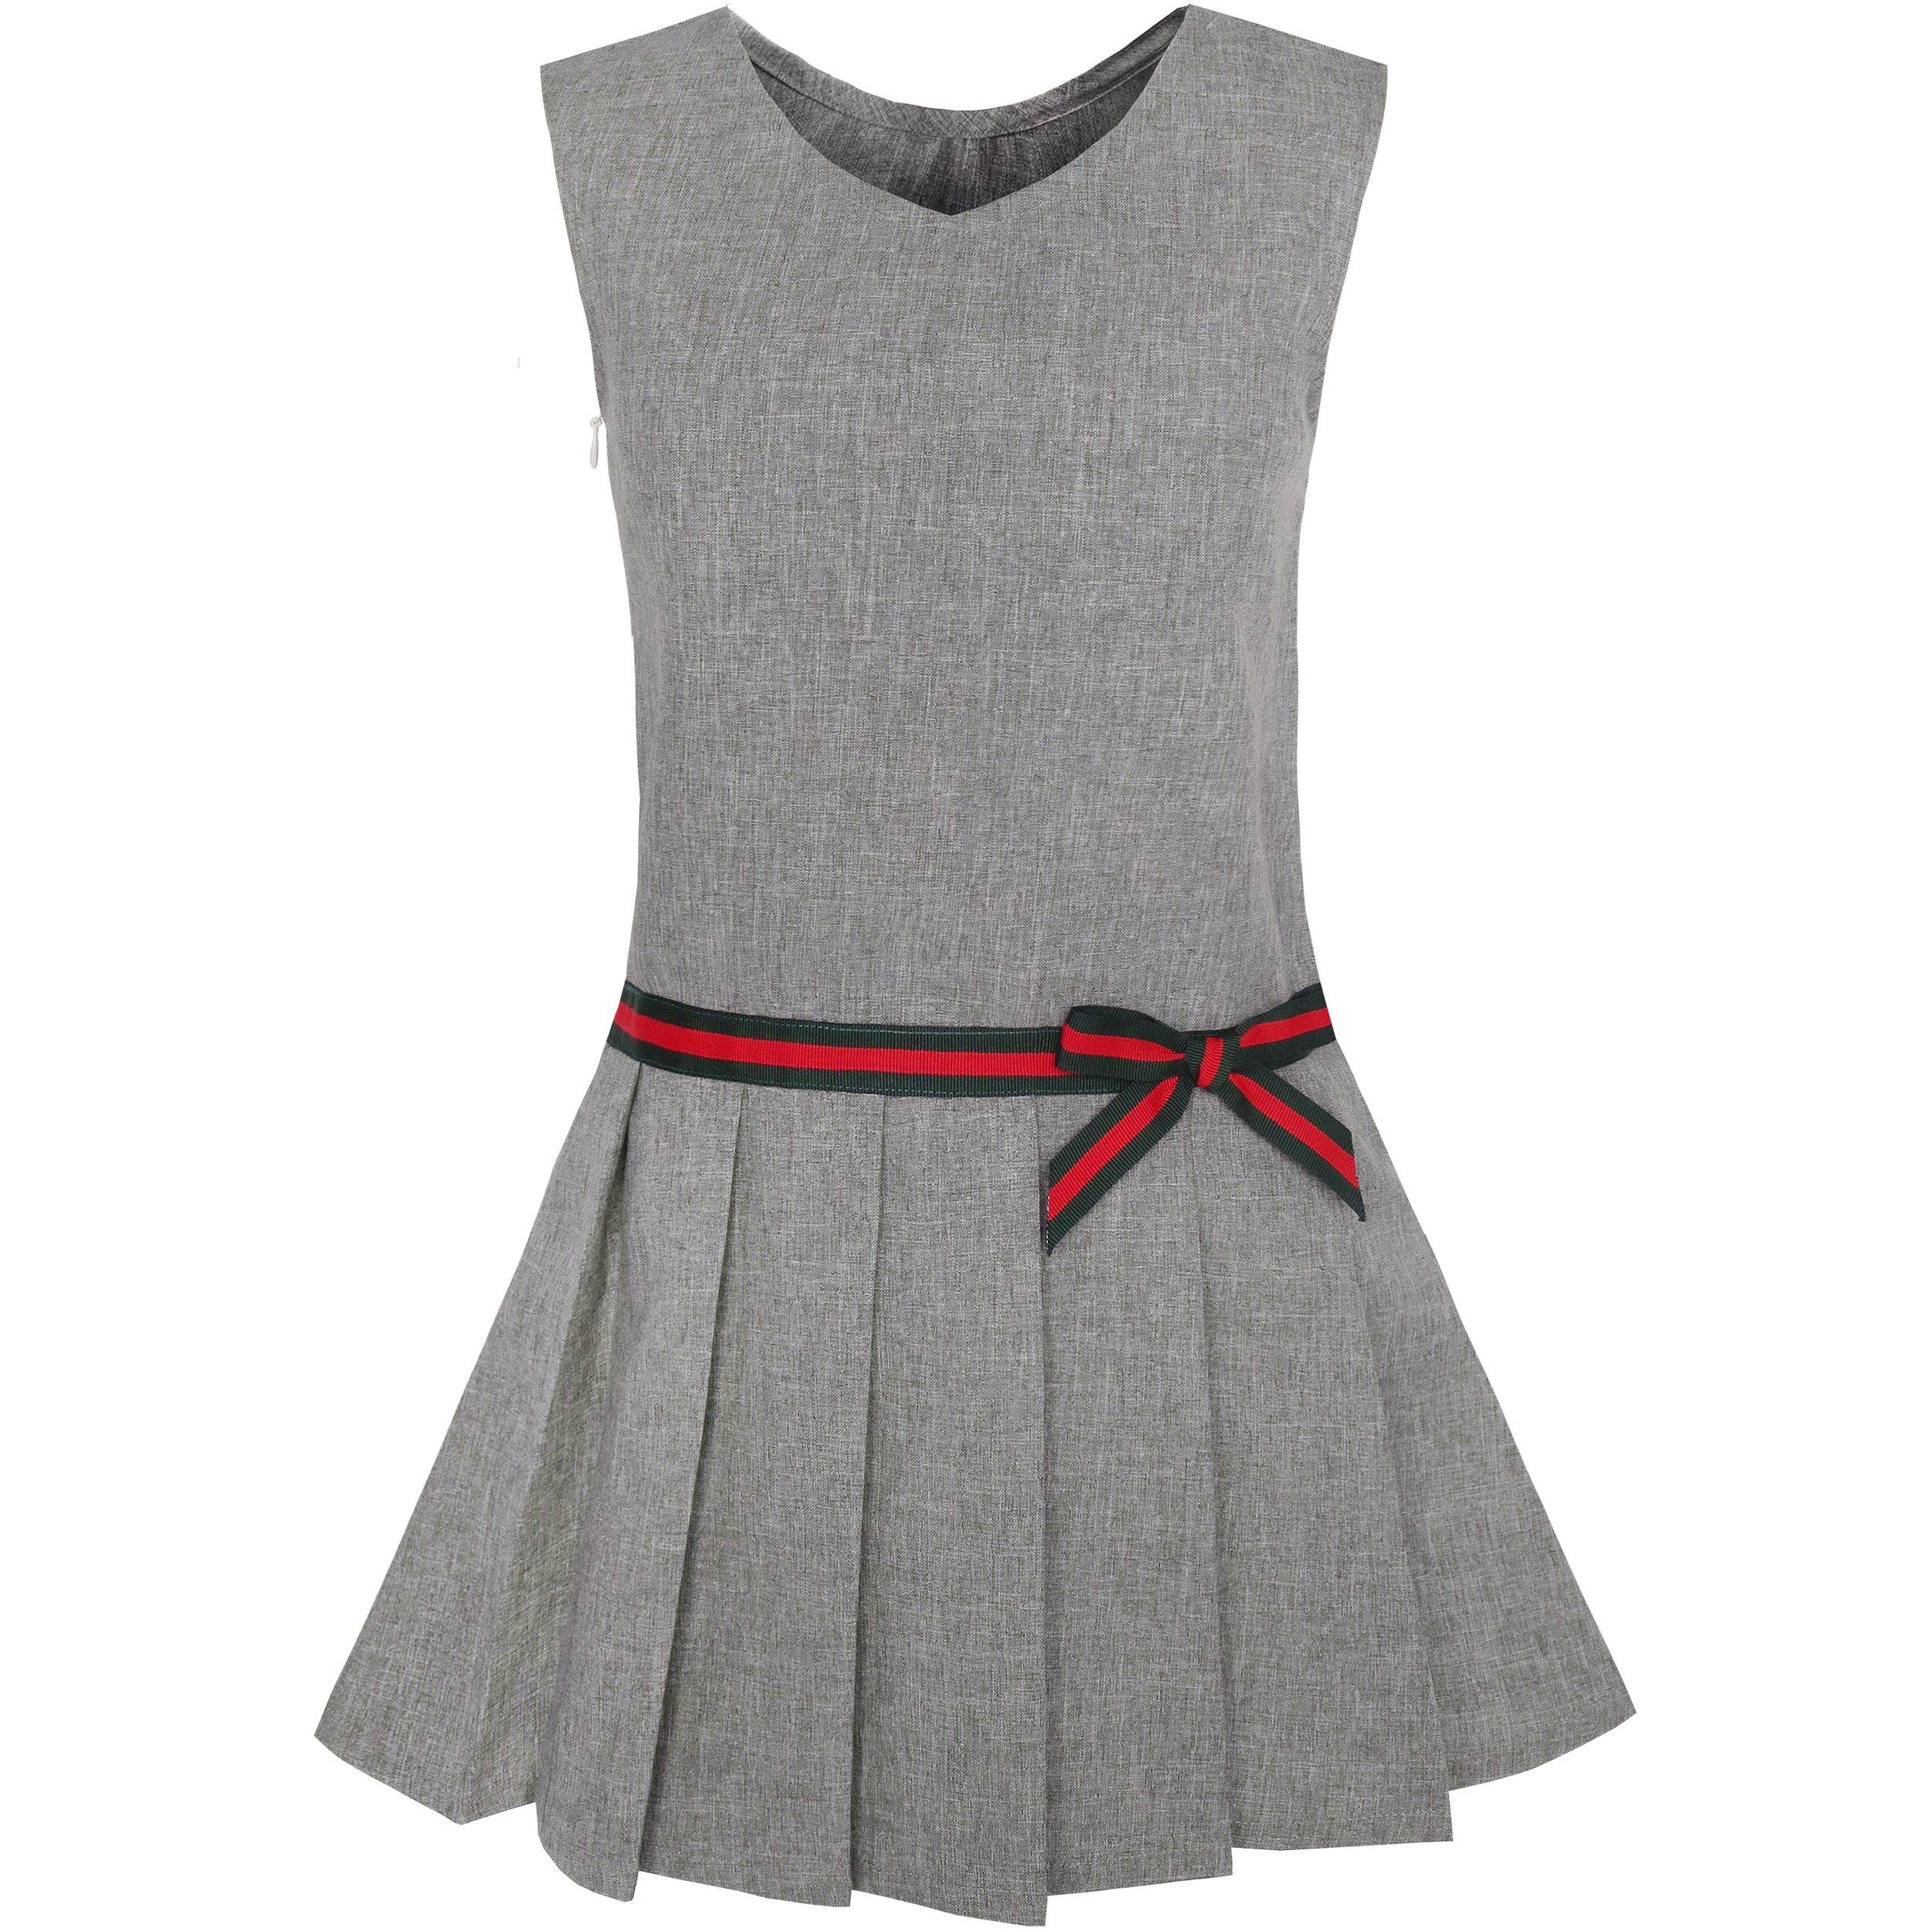 Sunny Fashion KX27 Girls Dress Gray School Pleated Skirt Dress Size 12